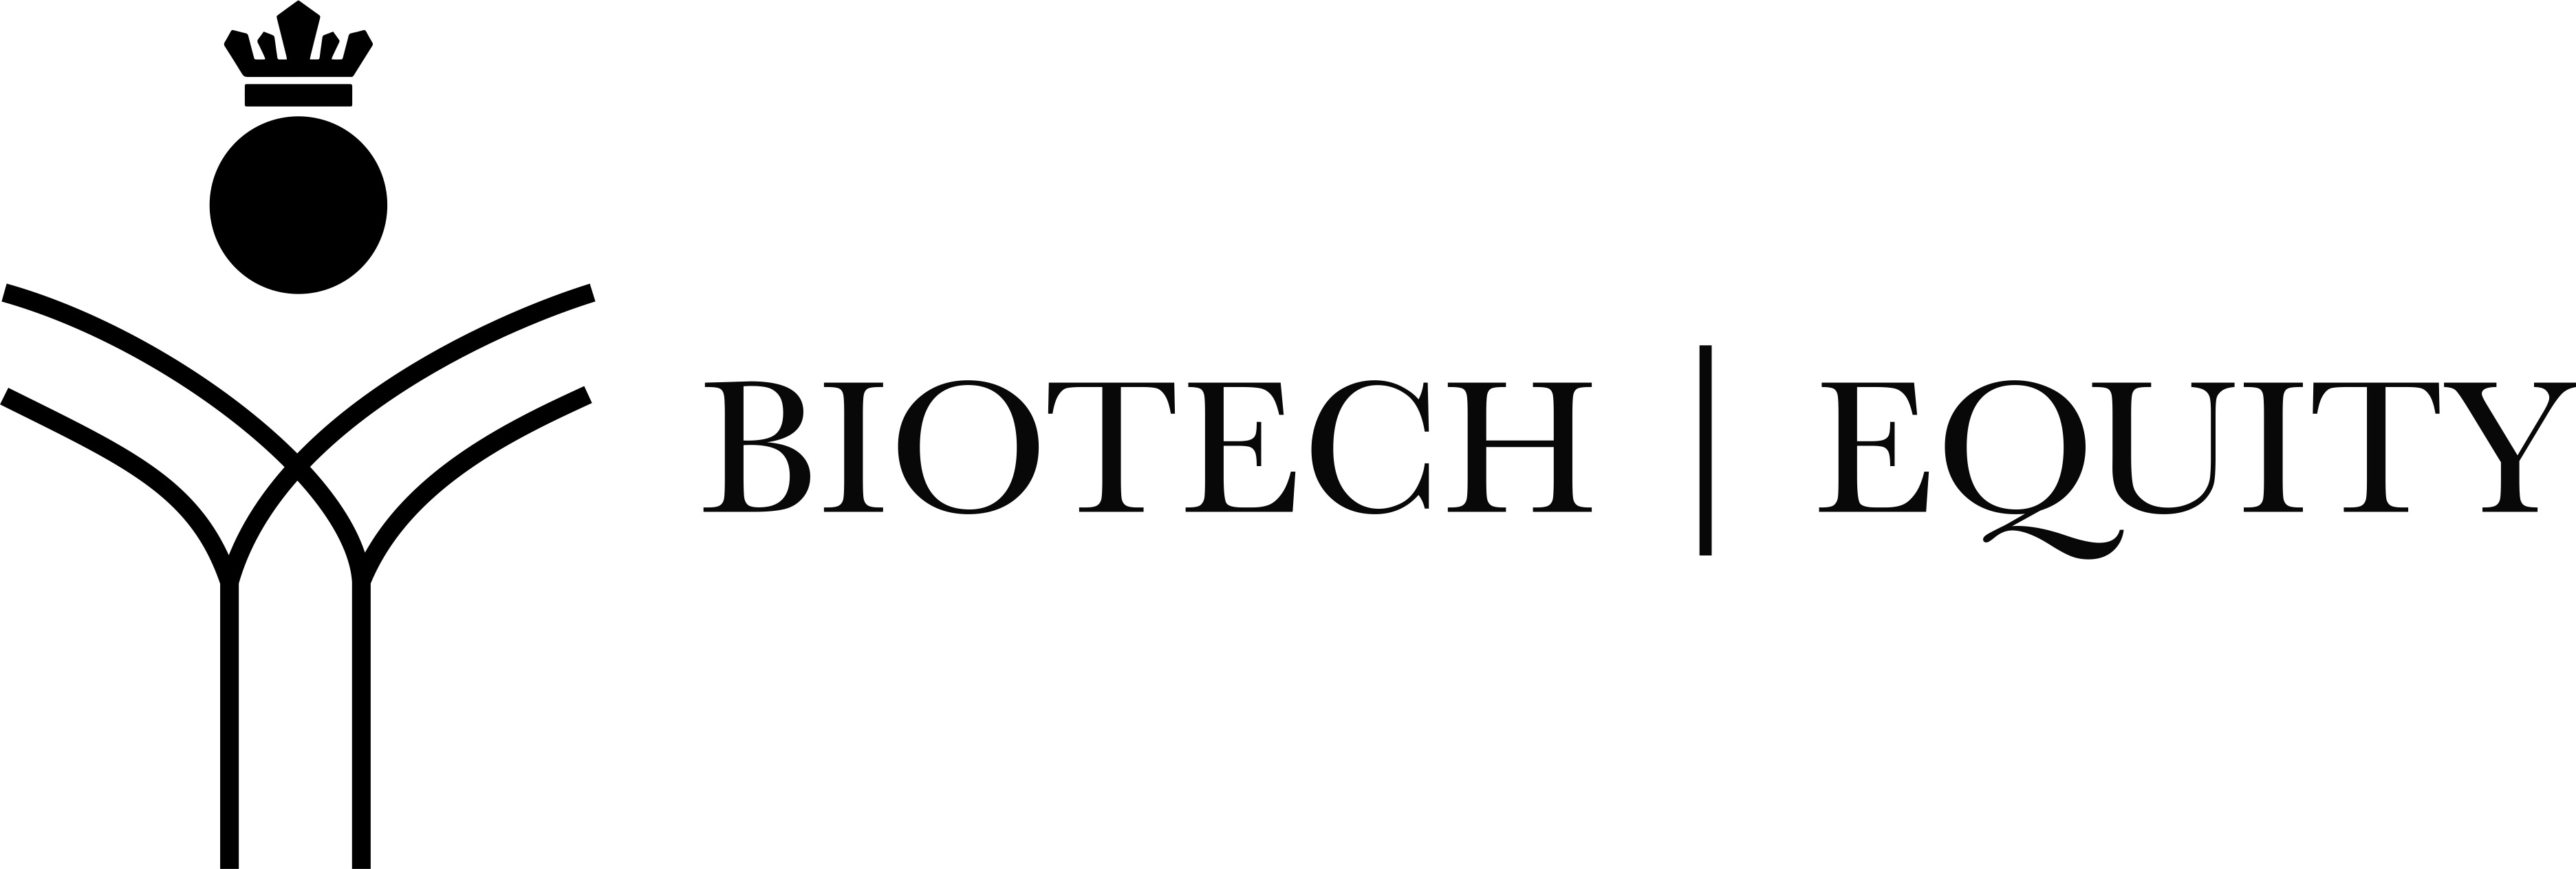 Biotech-IgG Equity AB